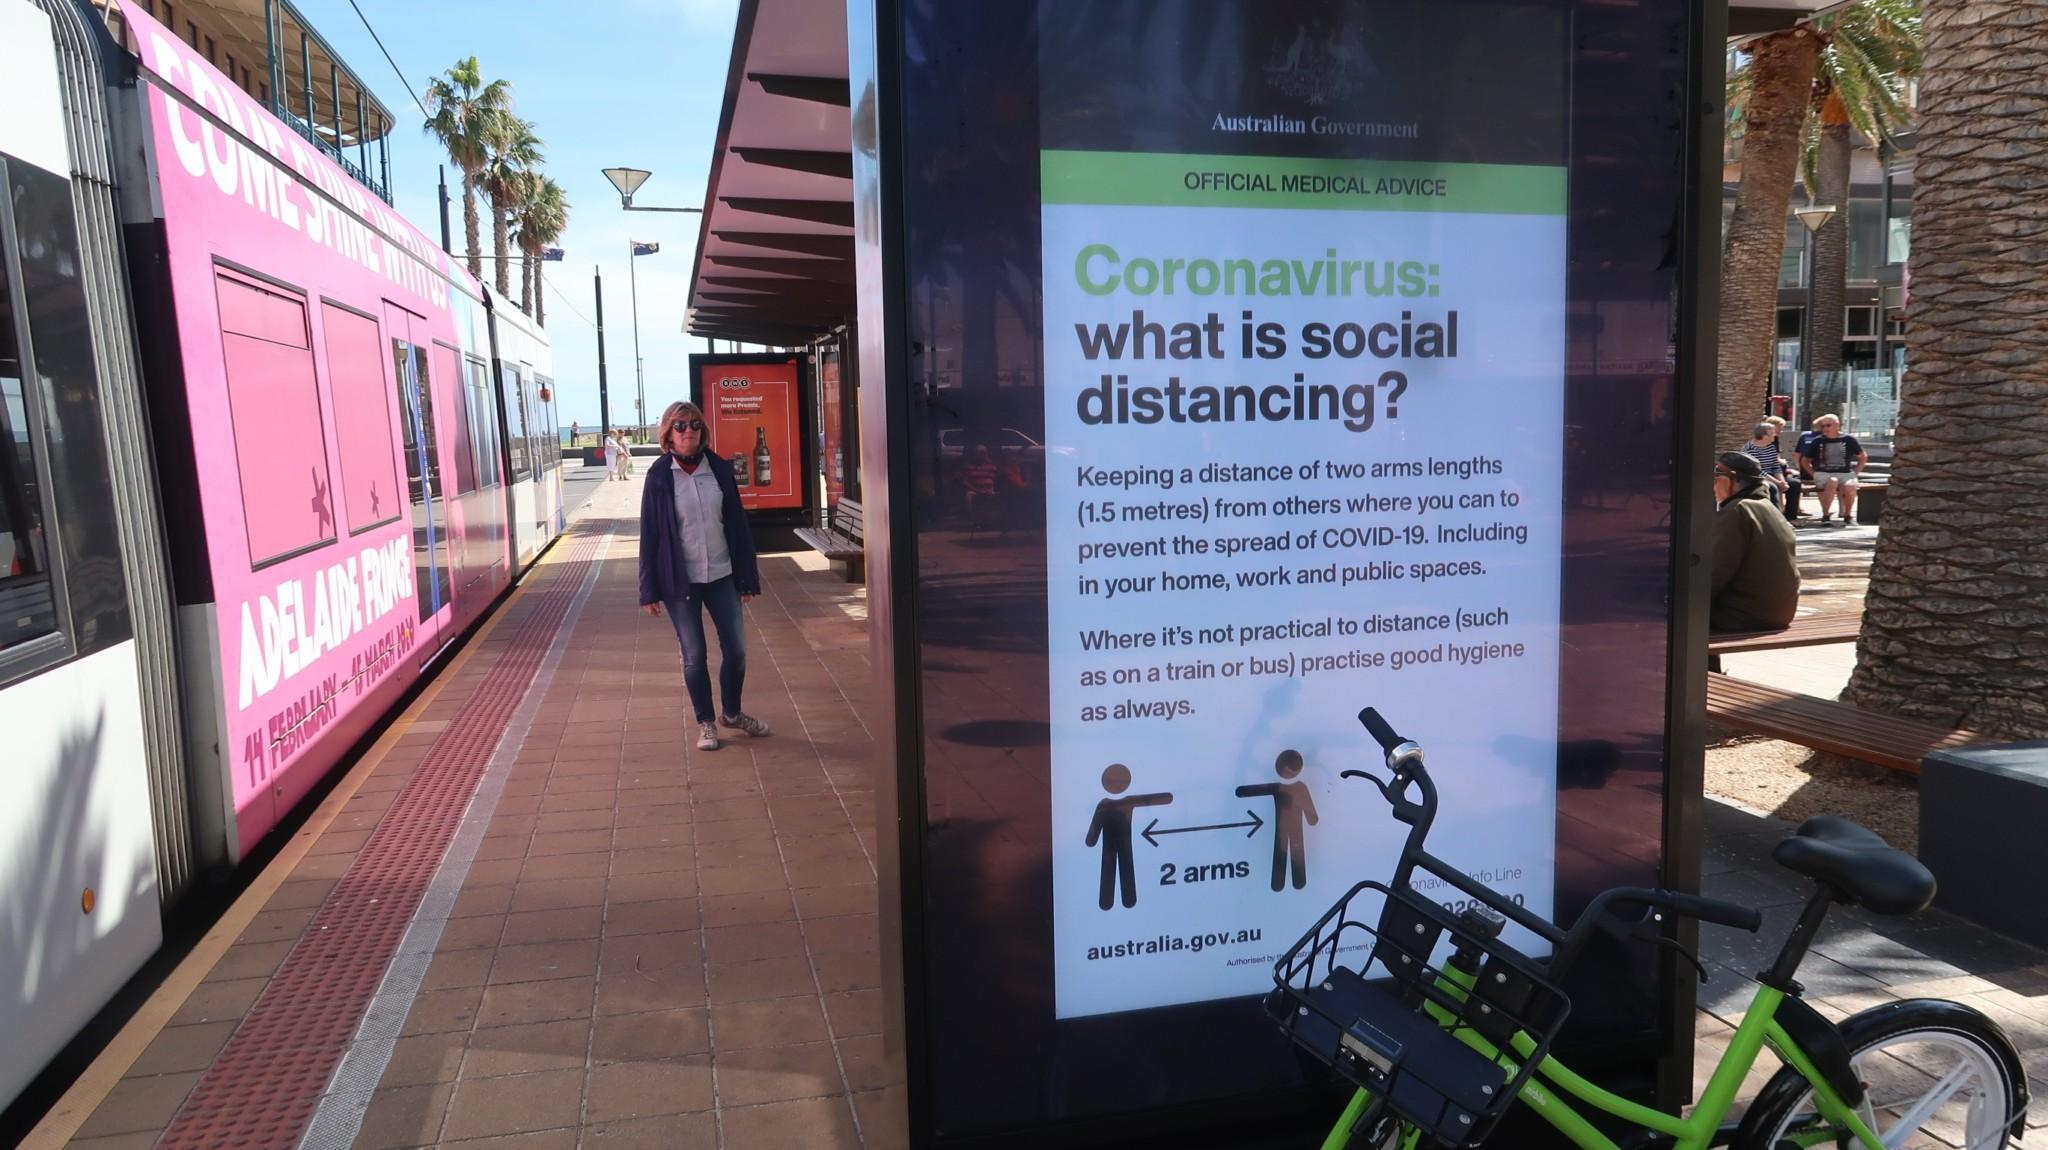 Corona-Hinweise, social distancing